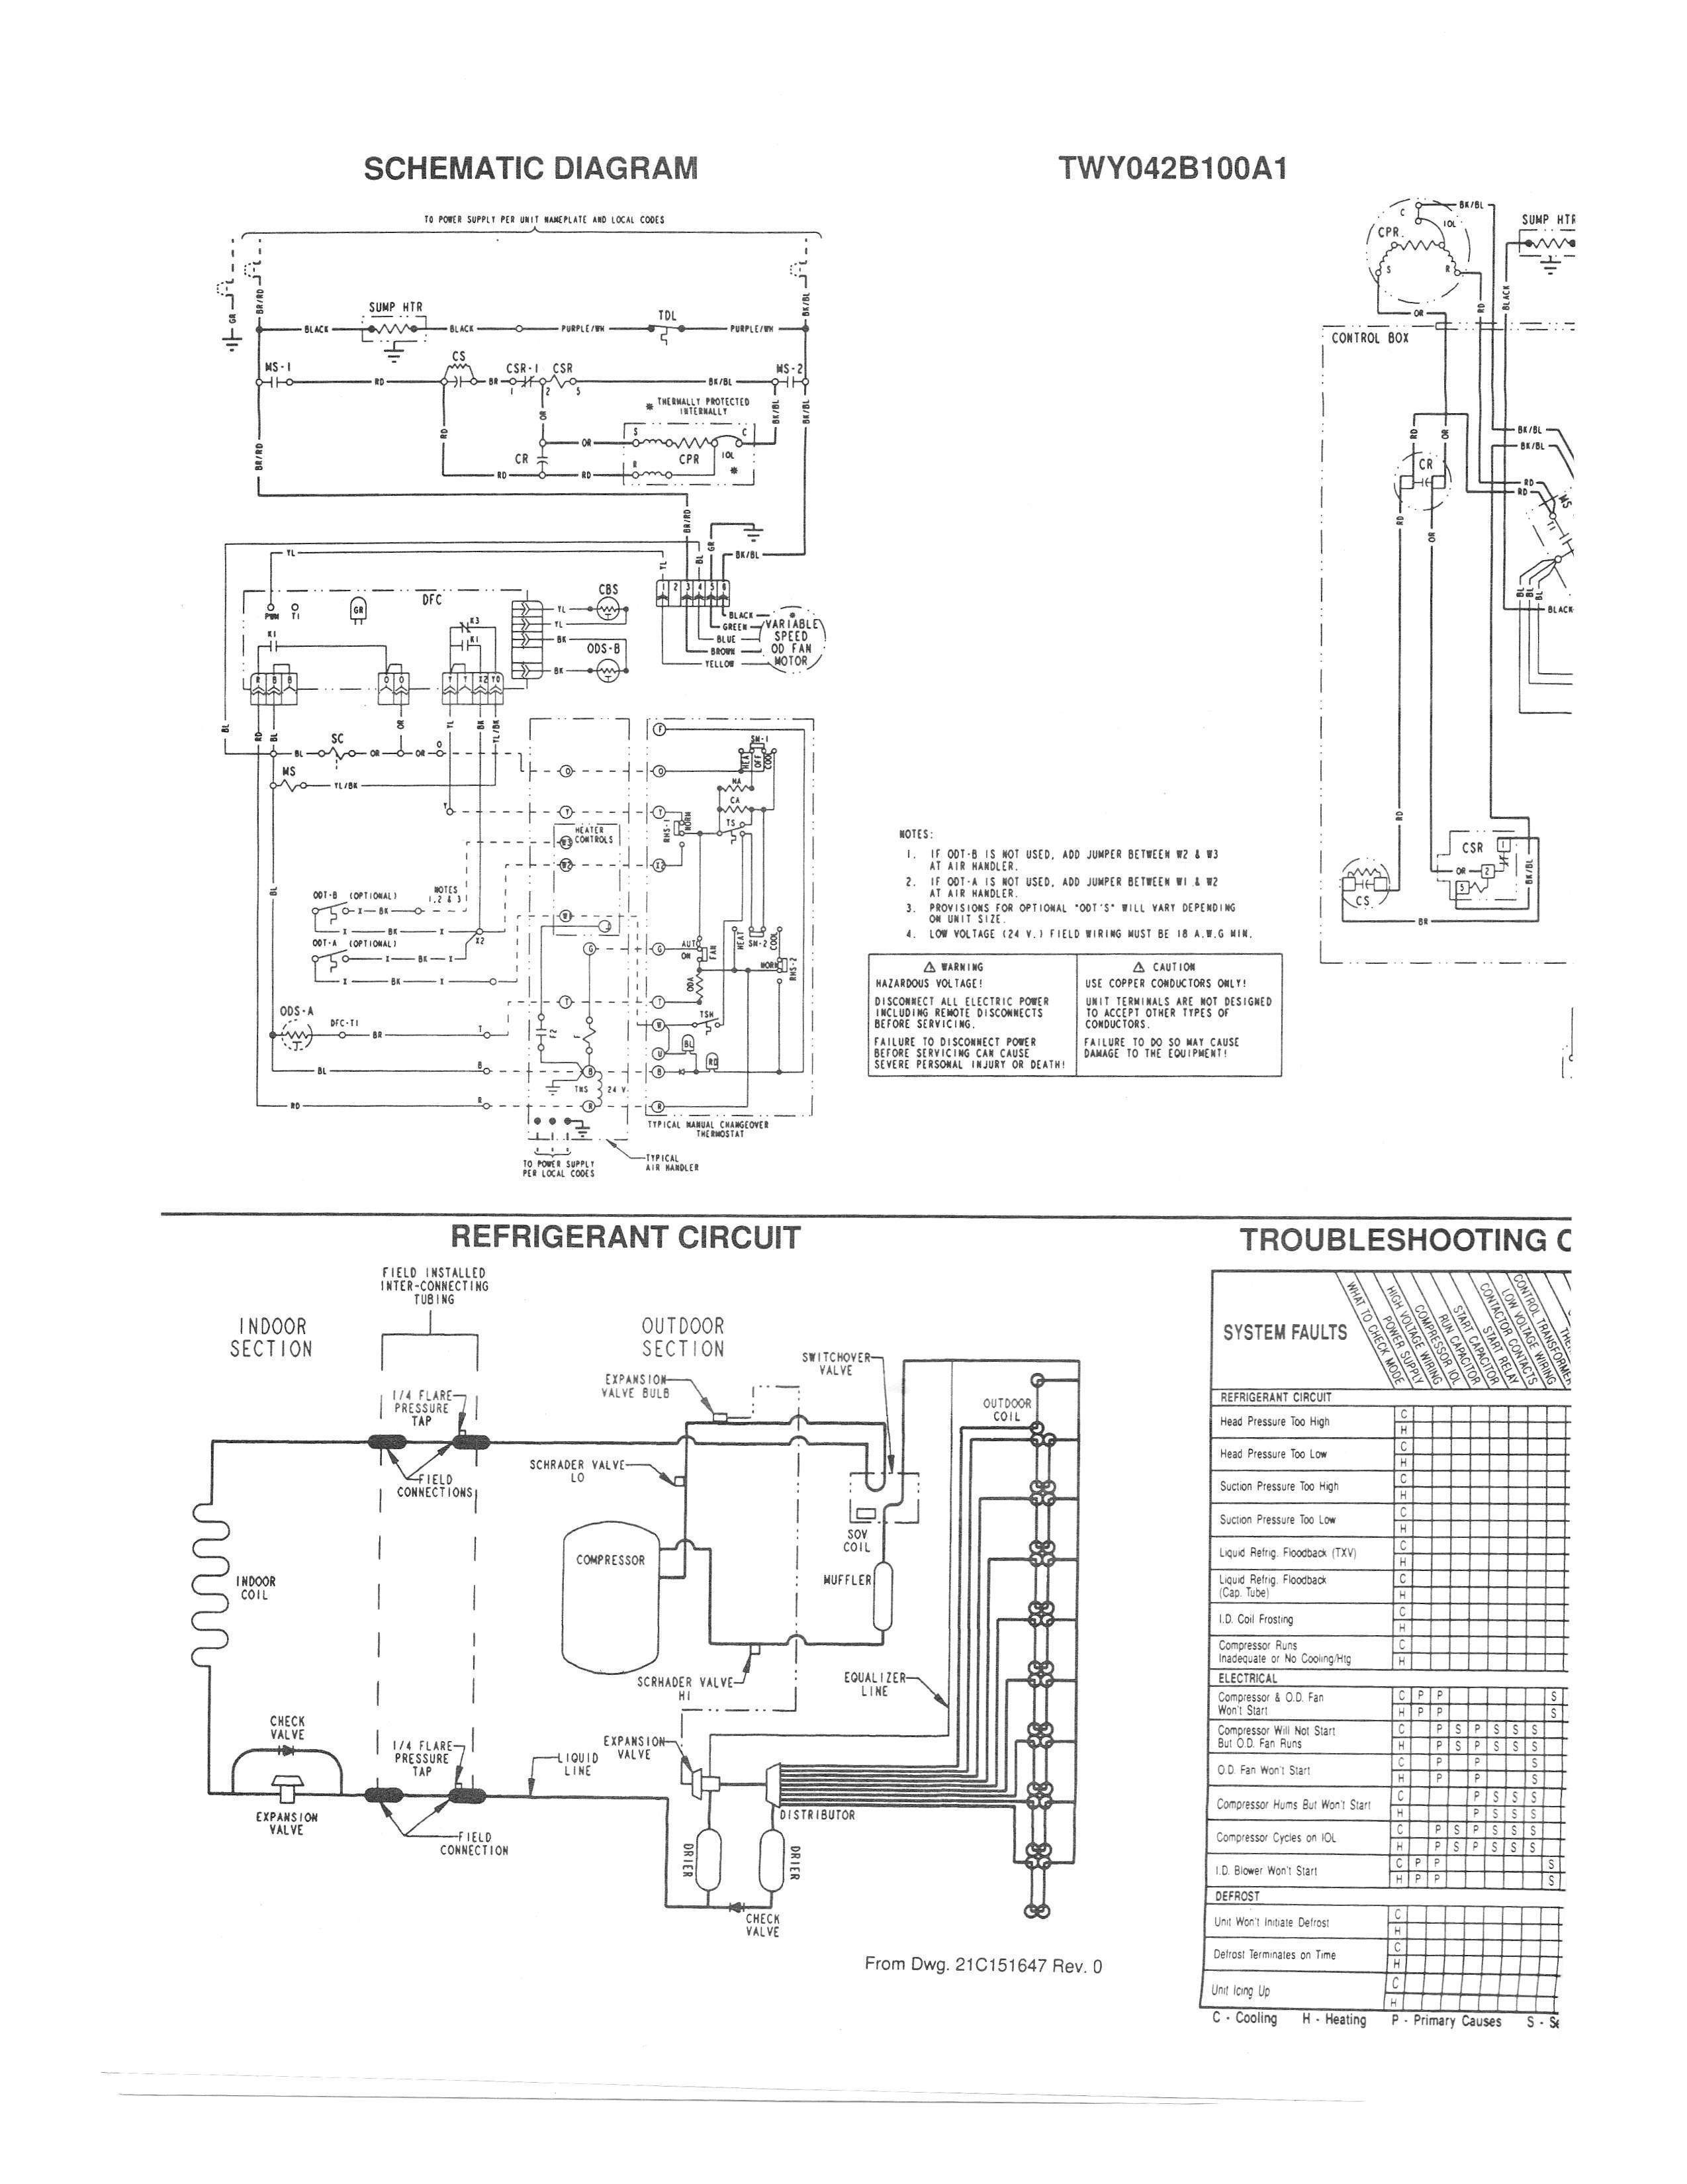 Wiring Diagram for Trane Air Conditioner Mcquay Air Conditioner ...